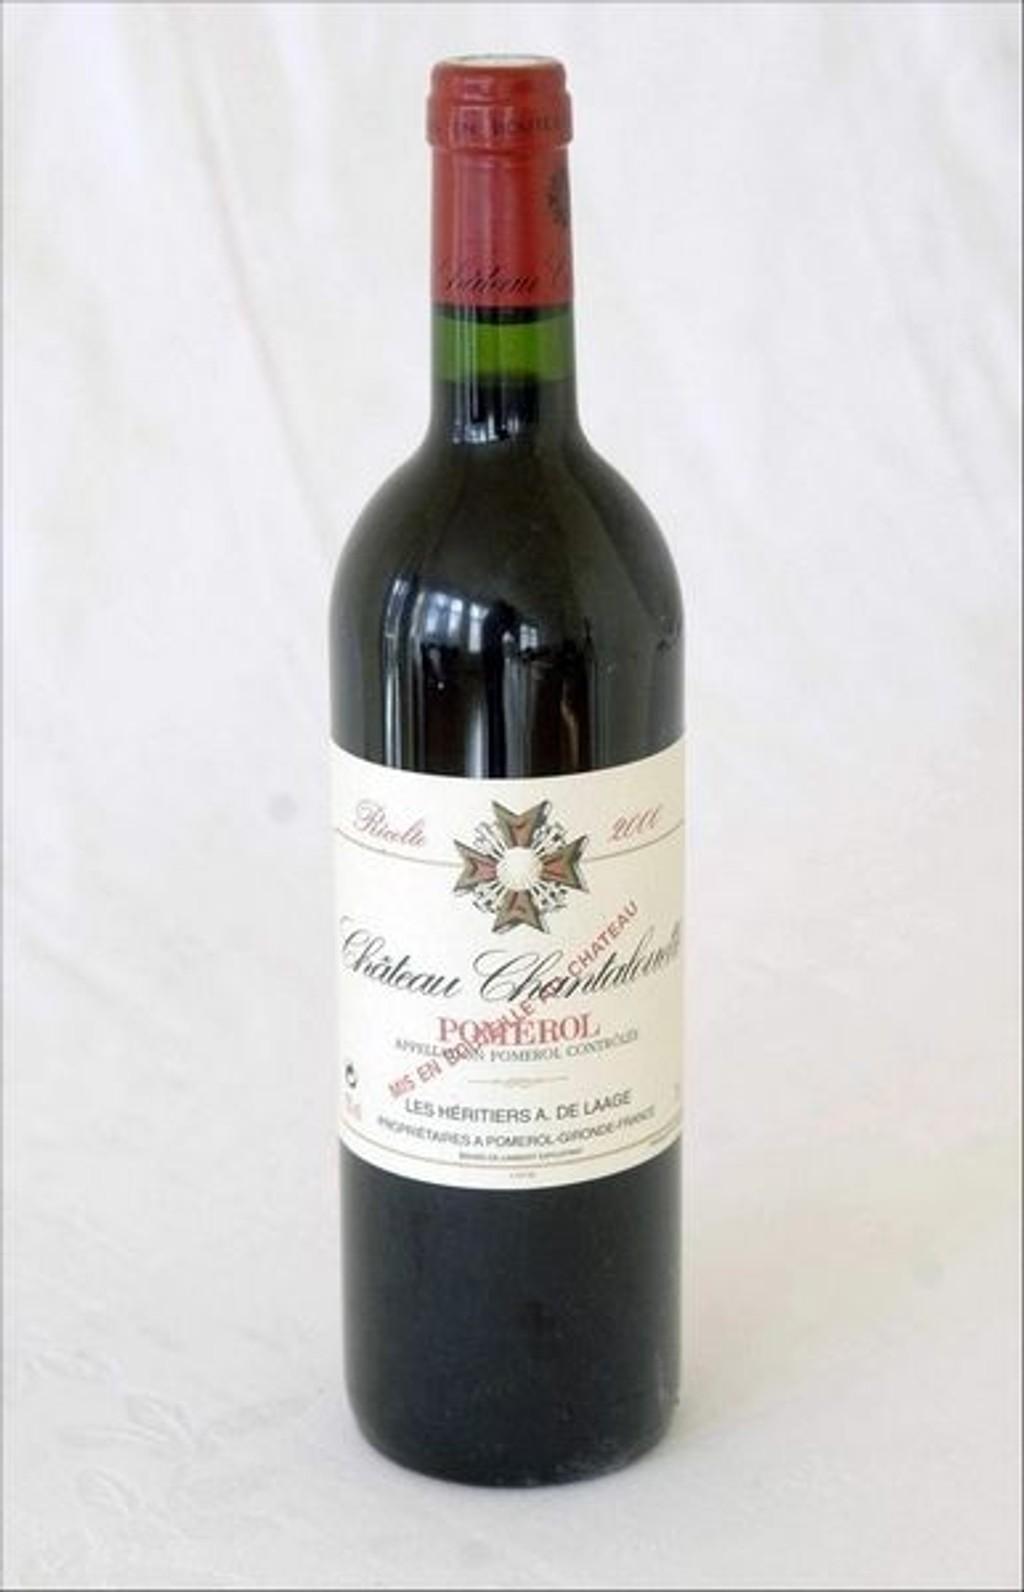 VIN: Ch. Chantalouette 2003, Pomerol, Bordeaux, Frankrike.